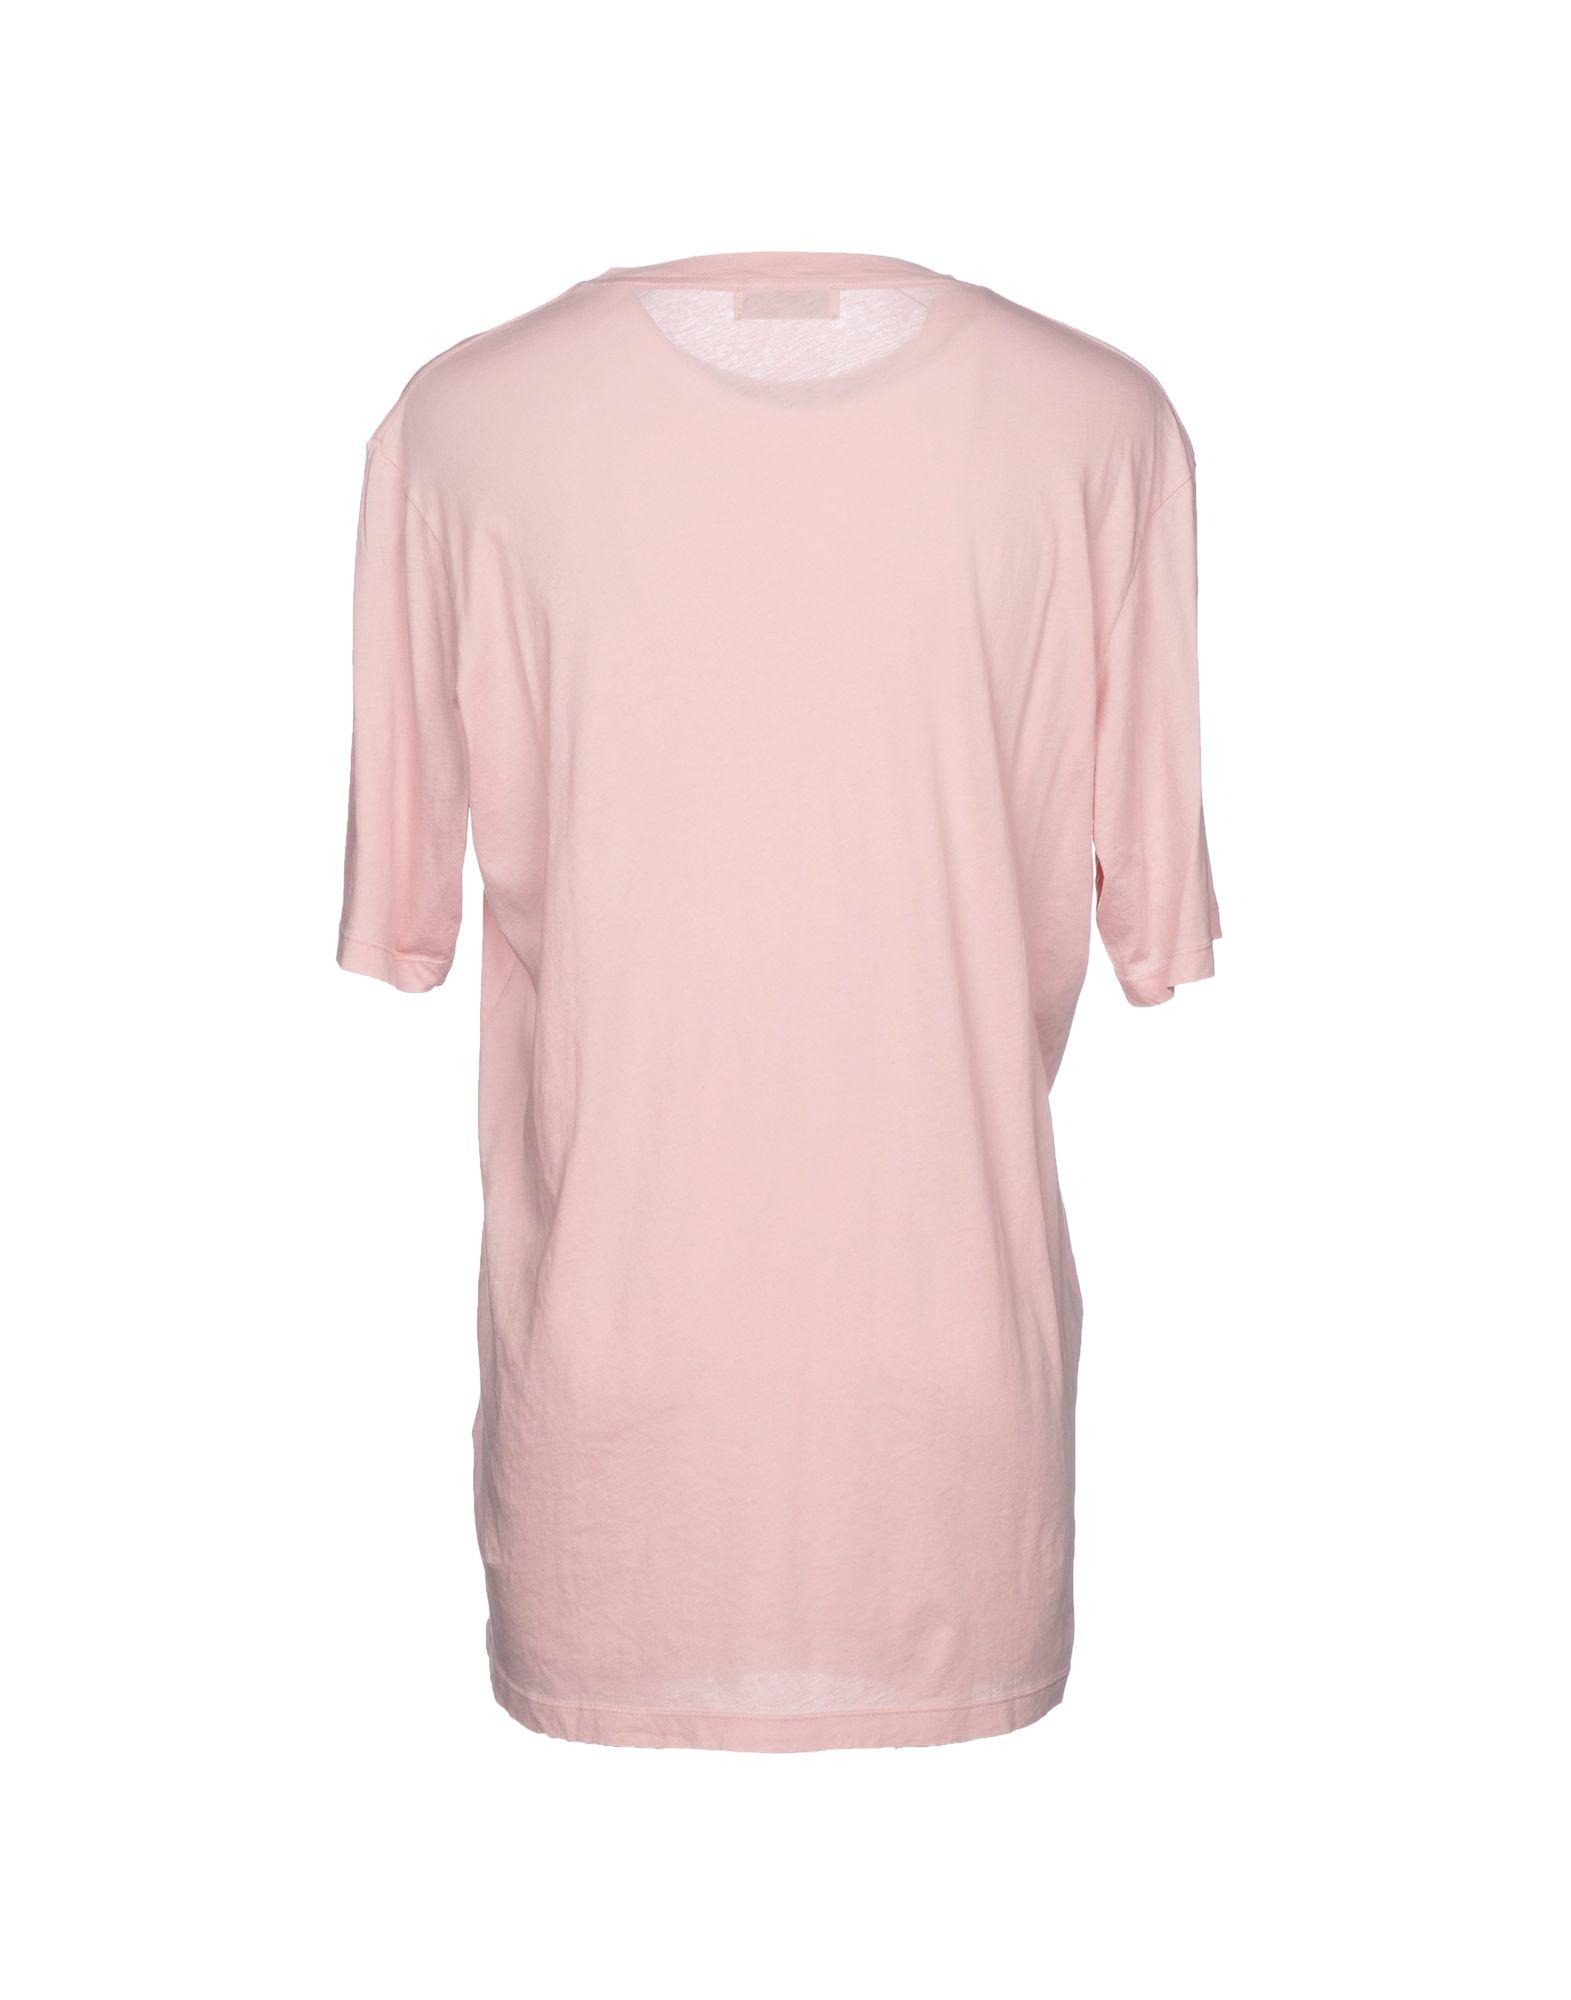 T-Shirt Uomo Faith Connexion Uomo T-Shirt - 12174874MR 7f0356